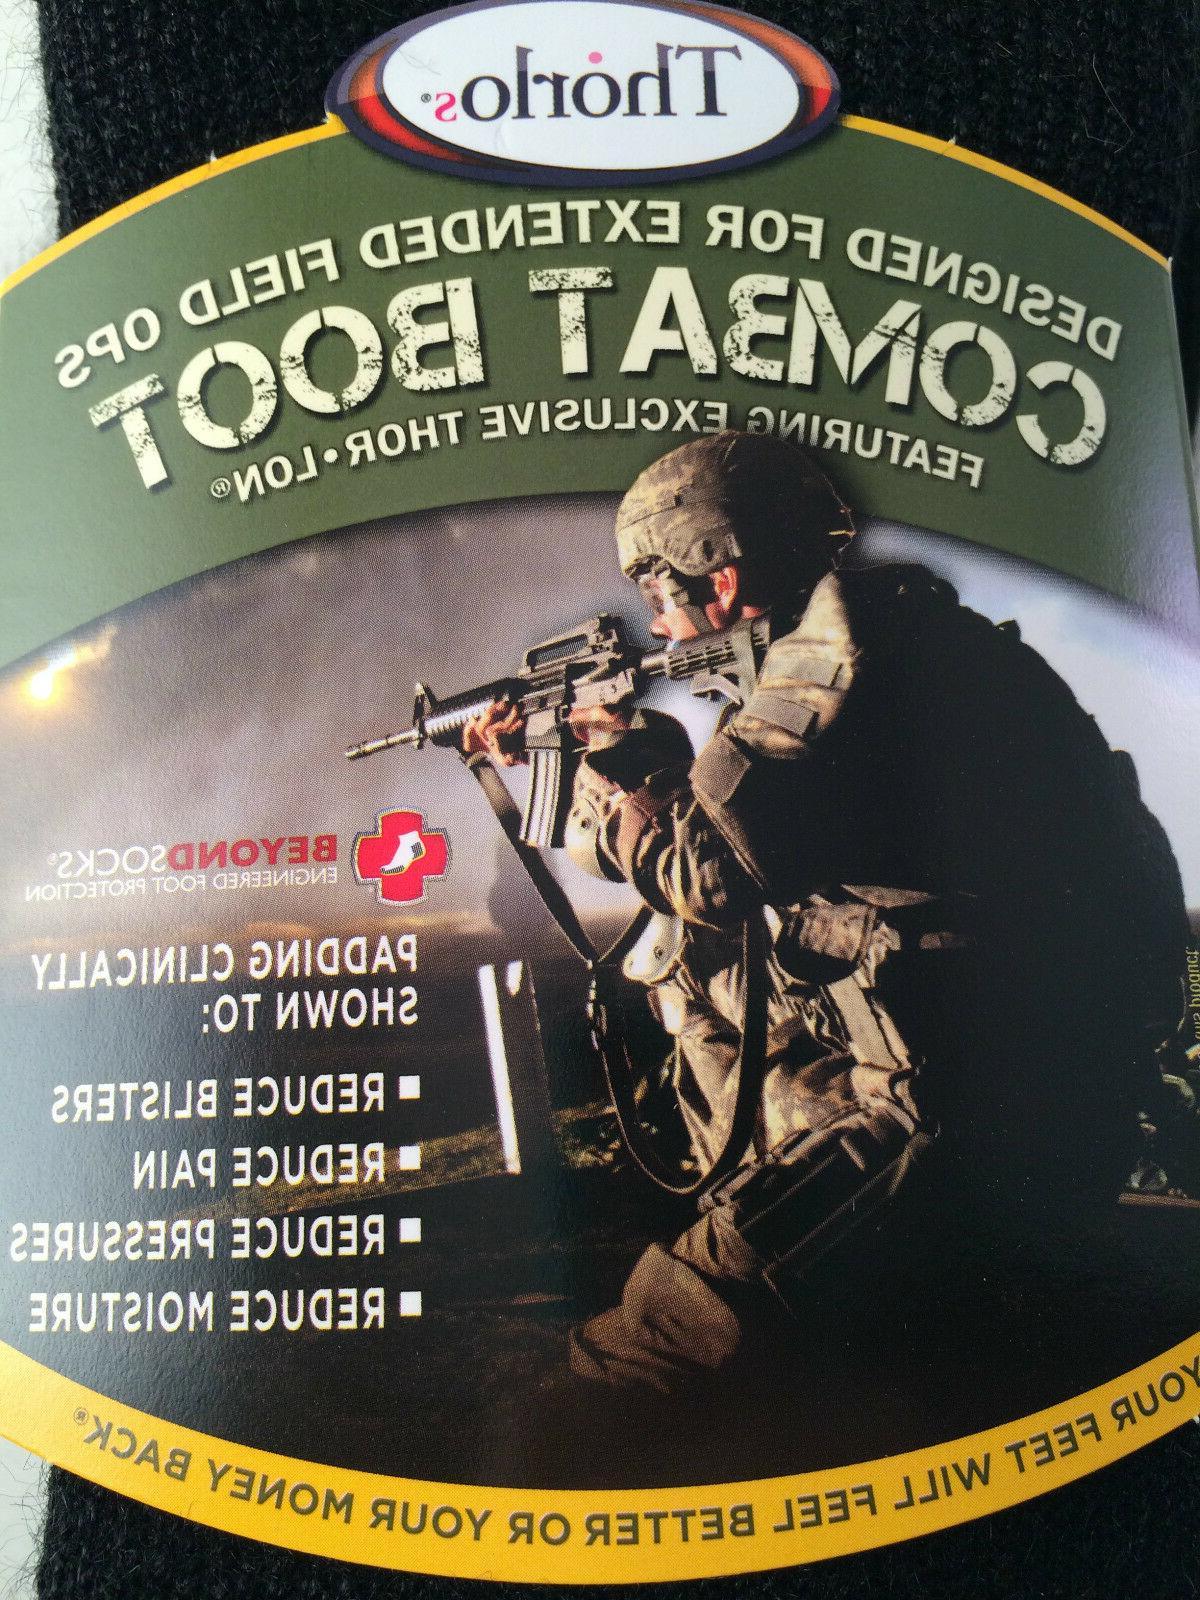 Thorlo Men's Combat Boot Overcalf Socks, Black, Large